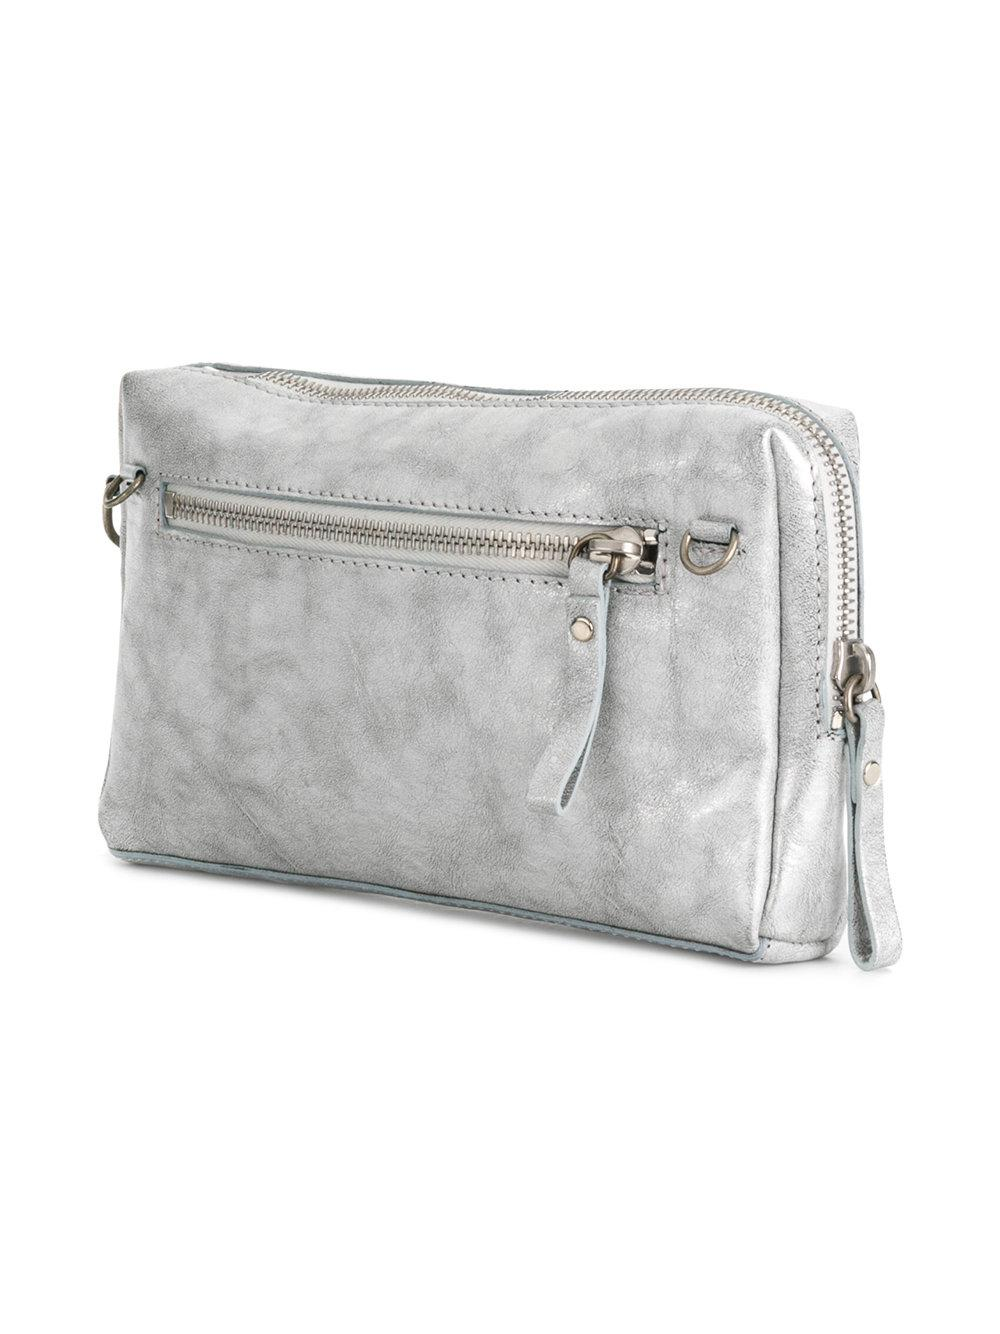 Marsèll Leather Scatolina 0324 Crossbody Bag in Grey (Grey)